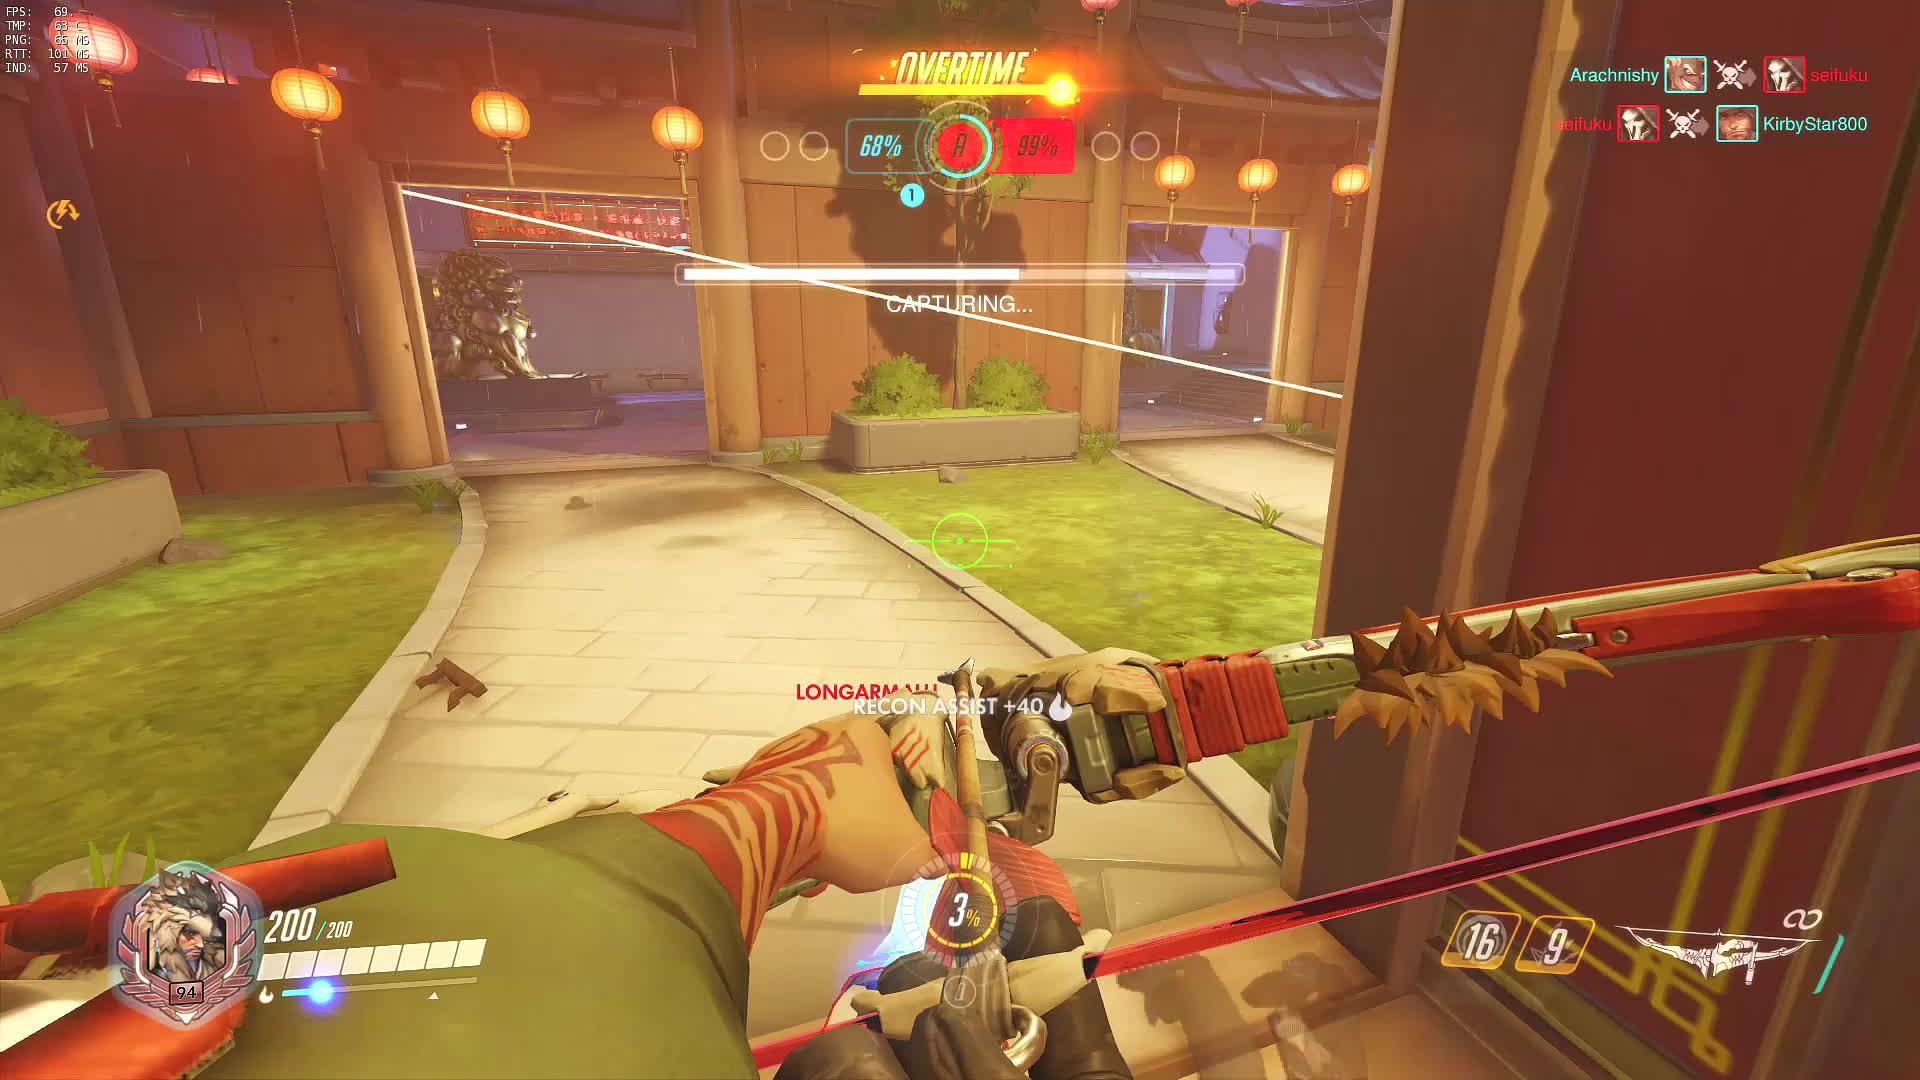 60fpsgaminggifs, Overwatch: Hanzo playing the objective (Slowmo) GIFs